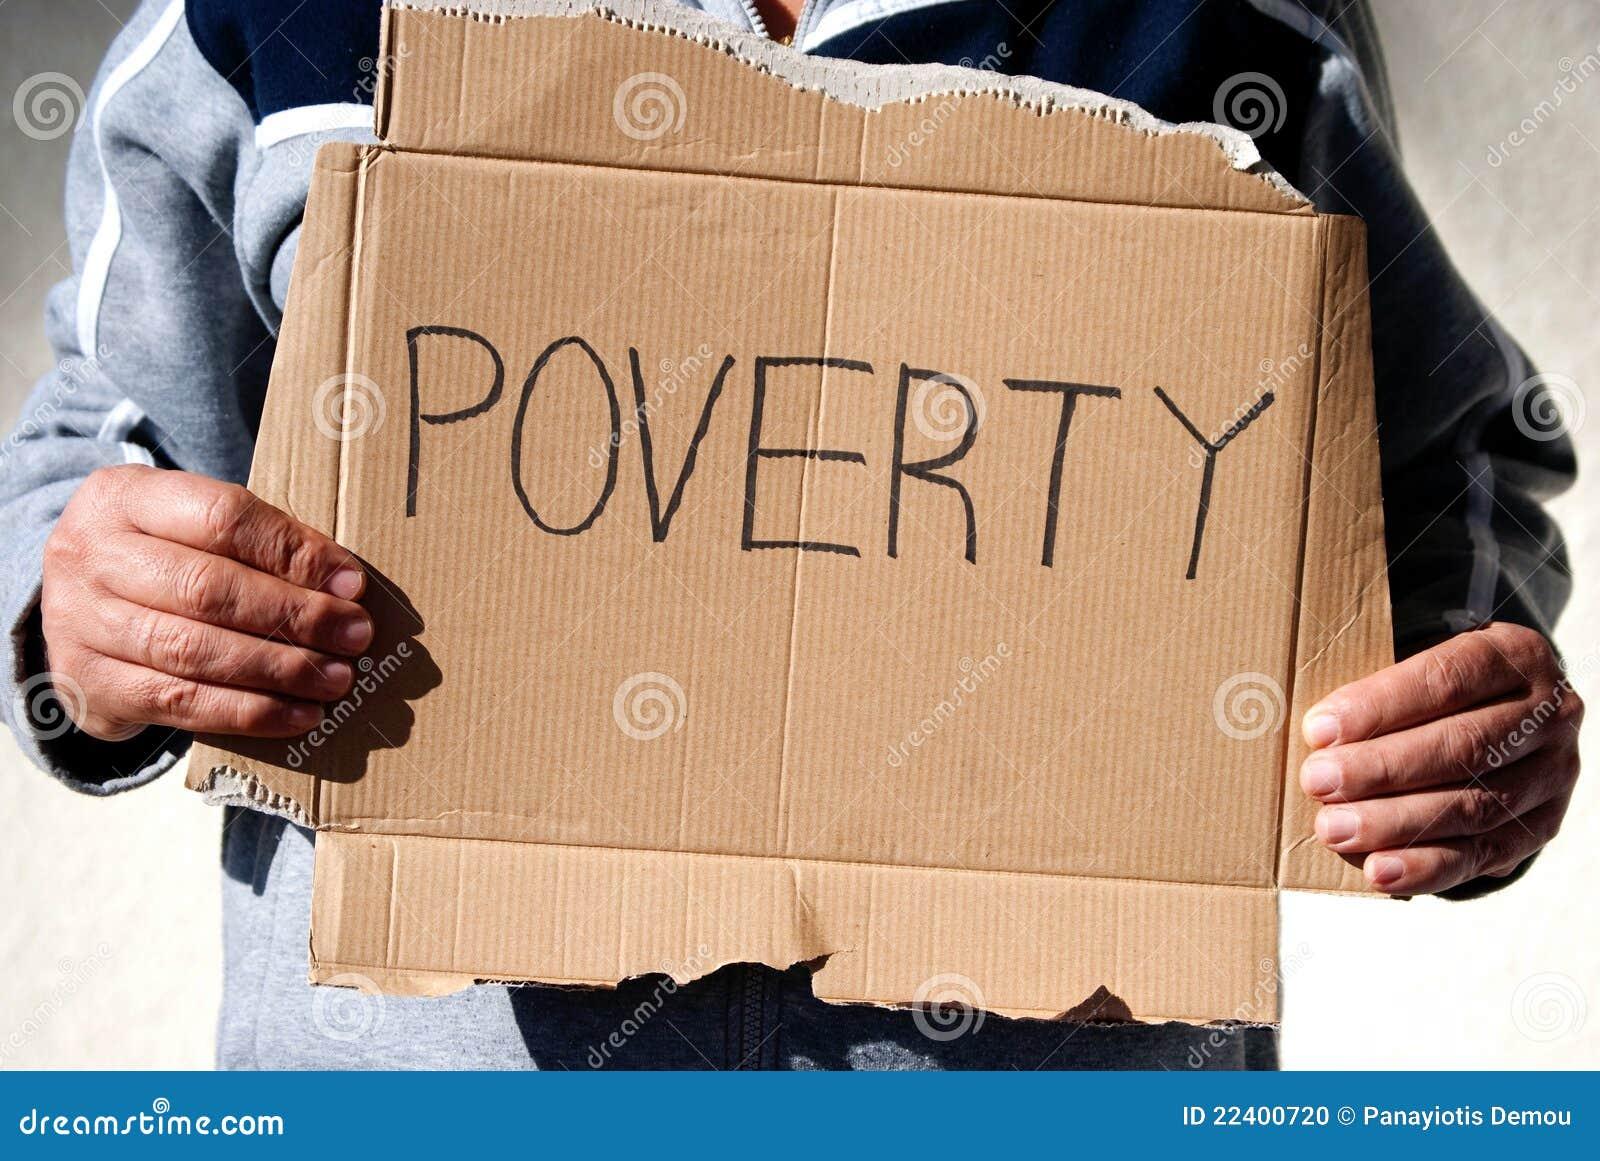 Poverty Stock Photo Image 22400720